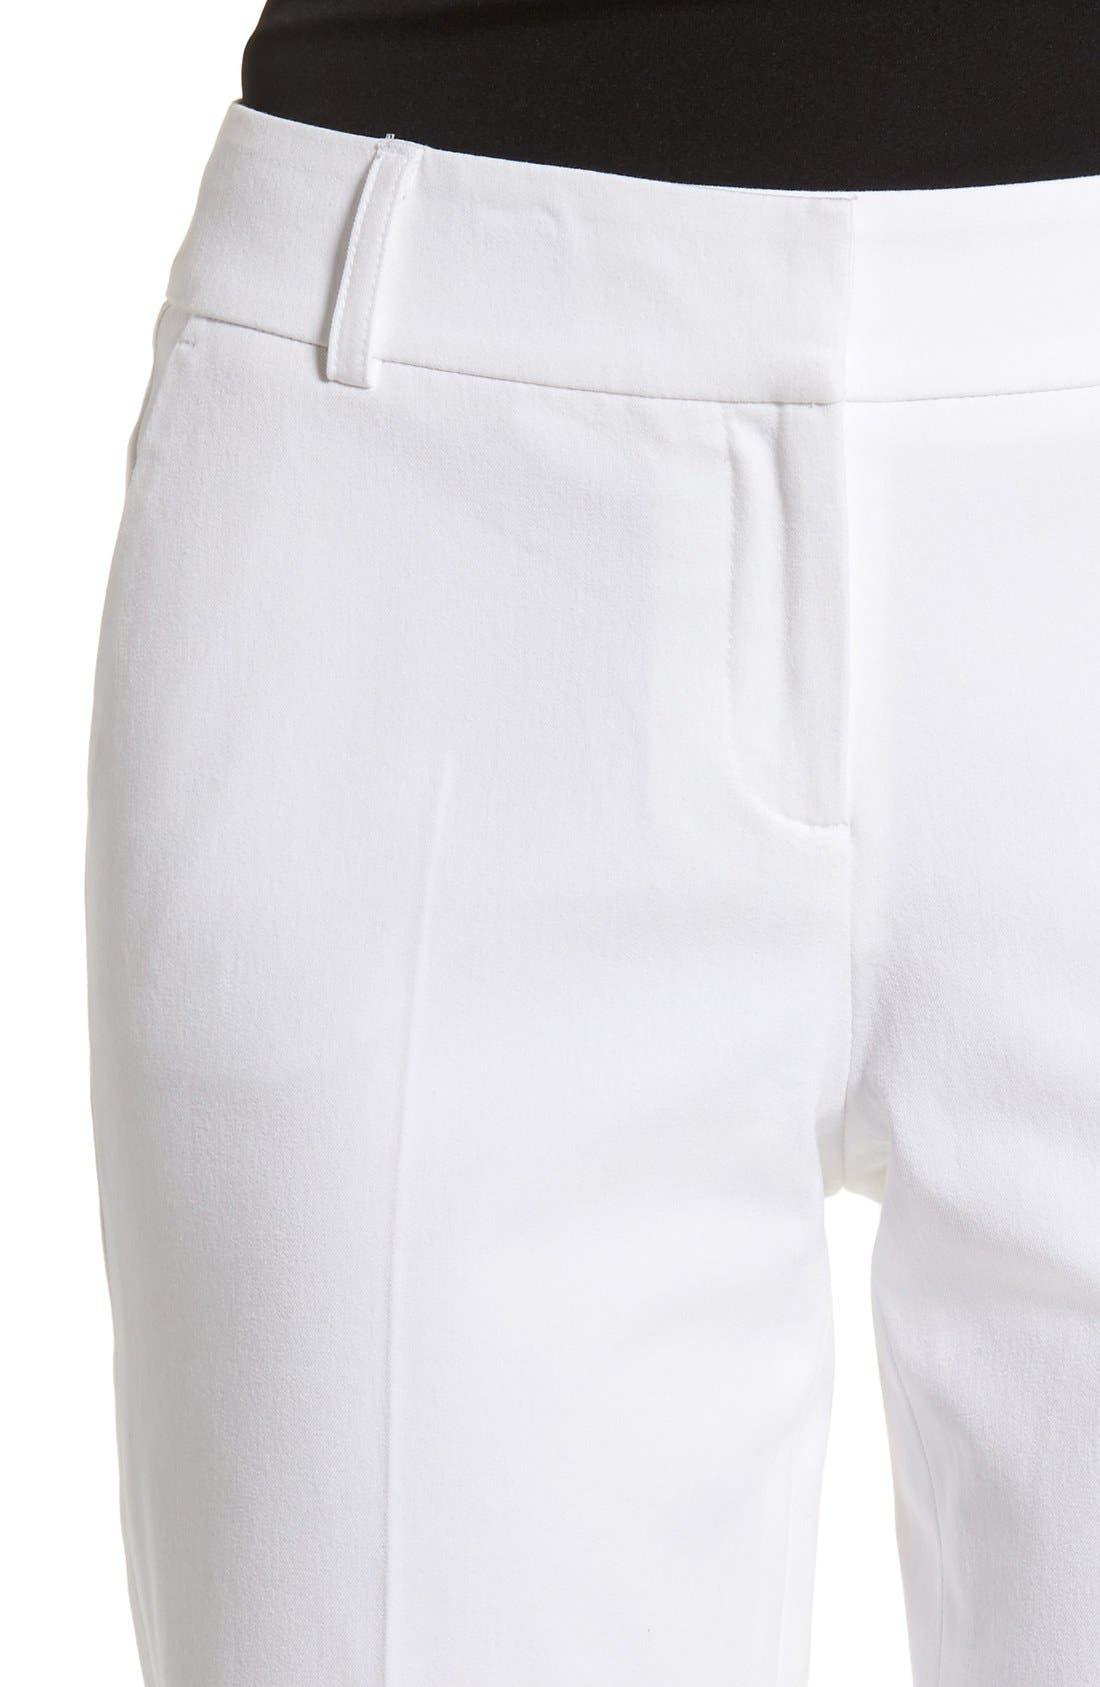 Stretch Bermuda Shorts,                             Alternate thumbnail 33, color,